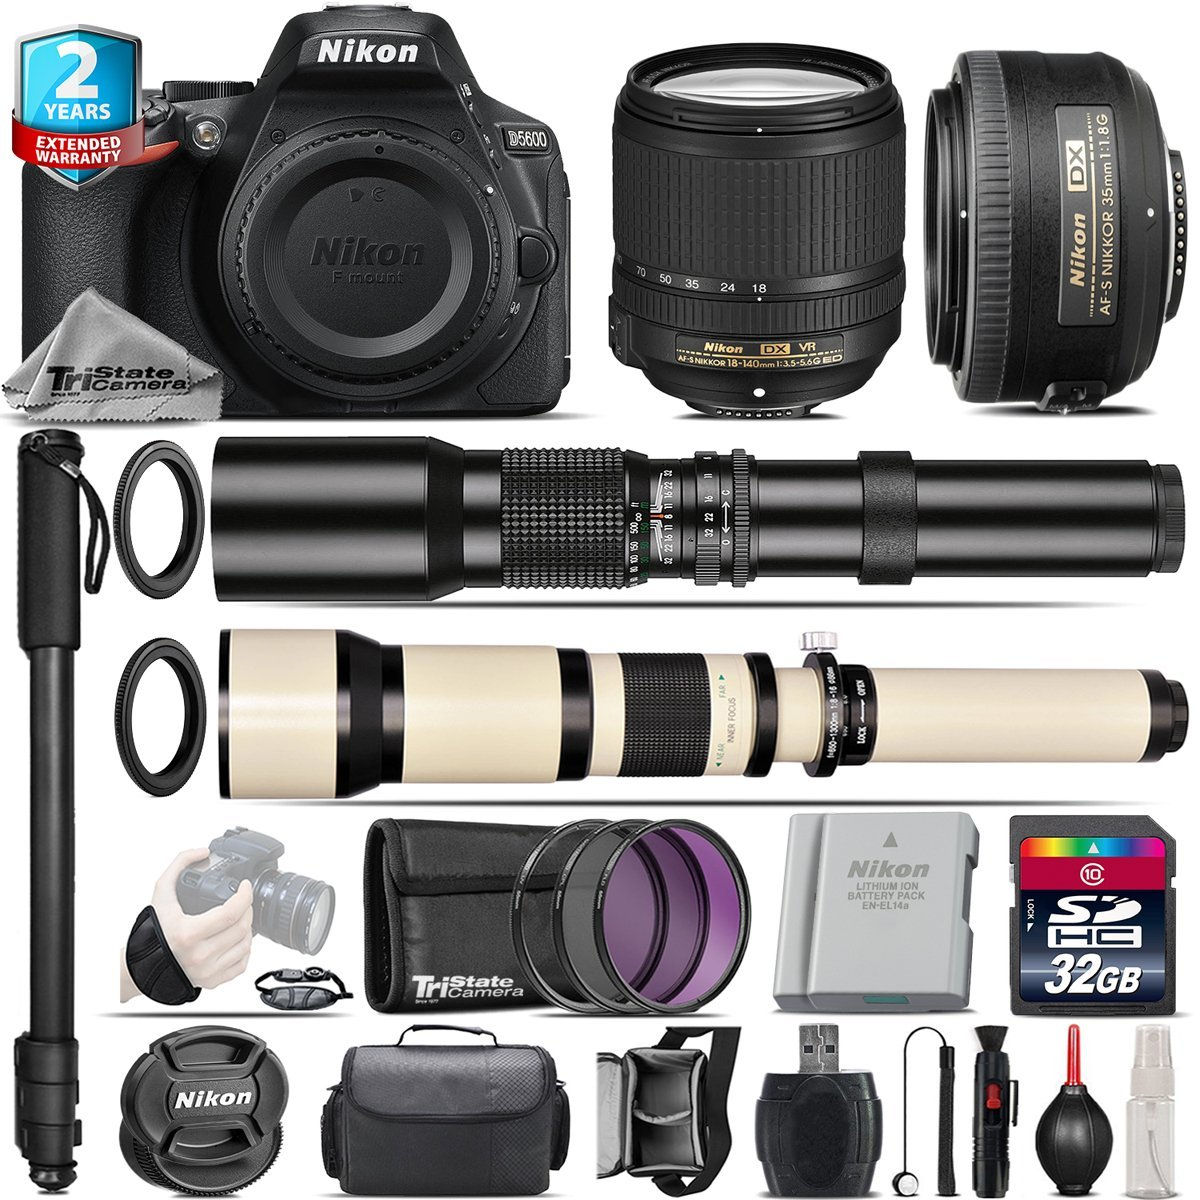 Holiday Saving Bundle for D5600 DSLR Camera + 18-140mm VR Lens + 35mm 1.8G DX Lens + 650-1300mm Telephoto Lens + 500mm Telephoto Lens + 2yr Extended Warranty + 32GB Class 10 - International Version